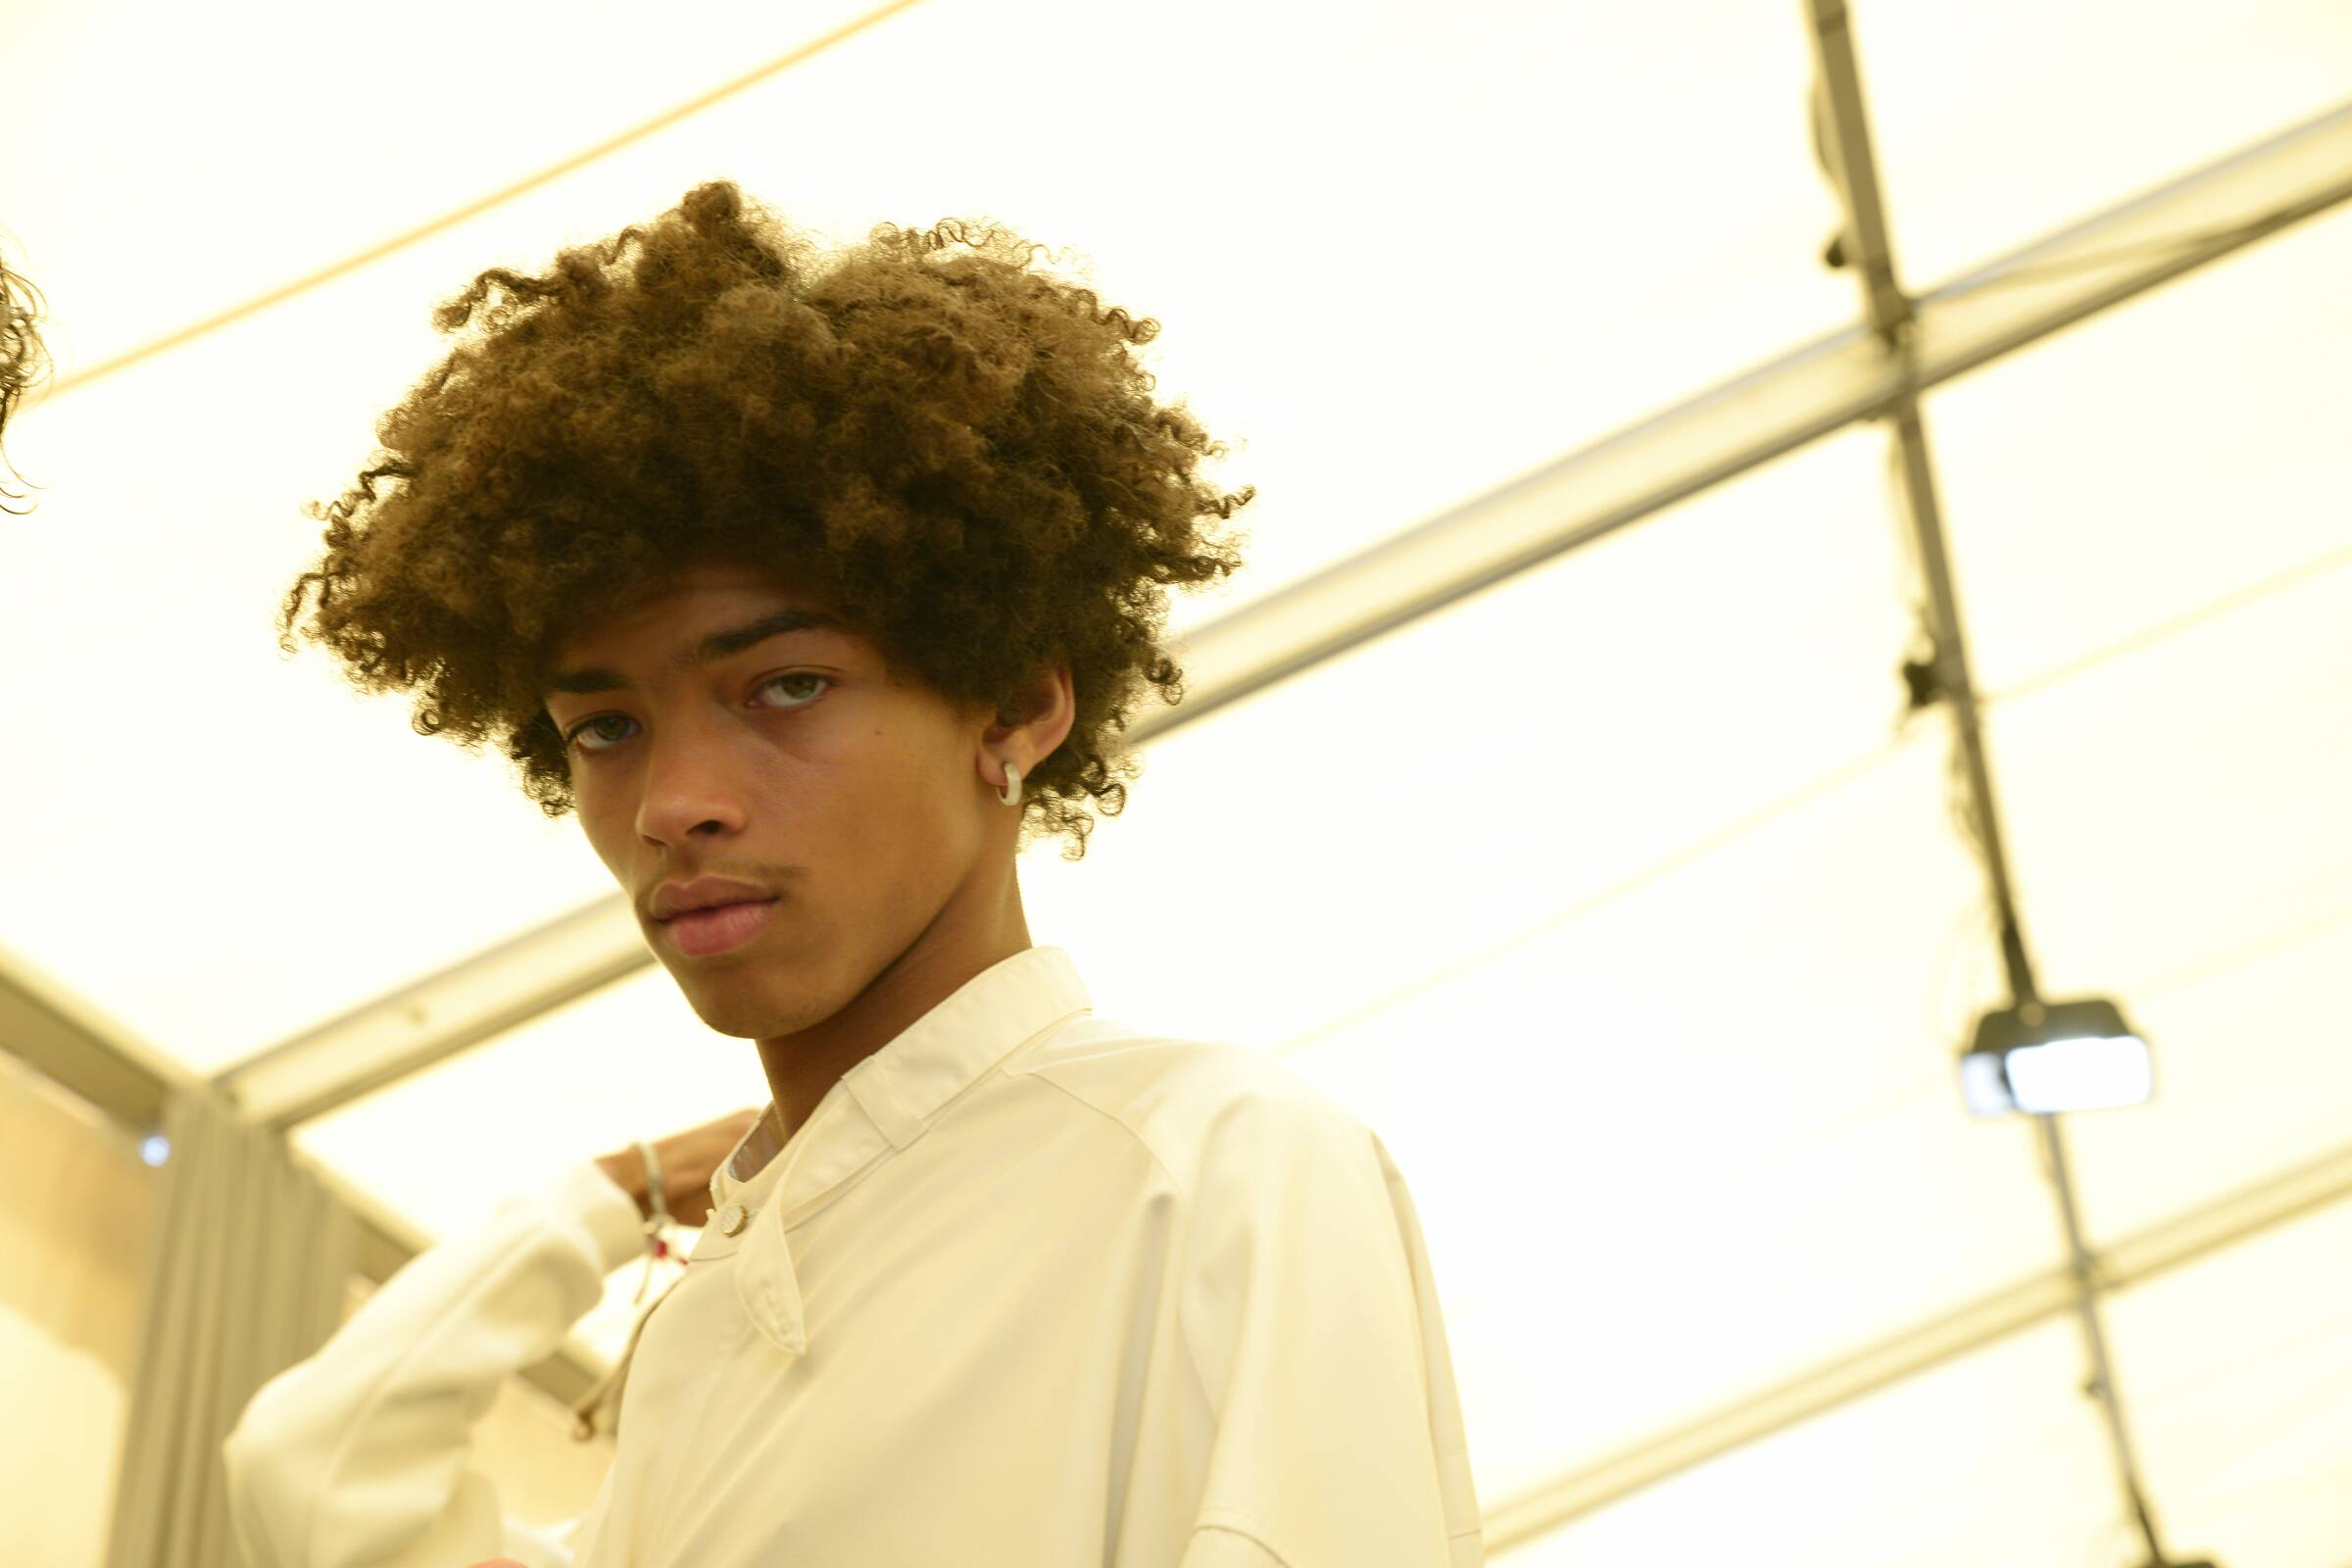 Man Model 2019 Backstage Louis Vuitton